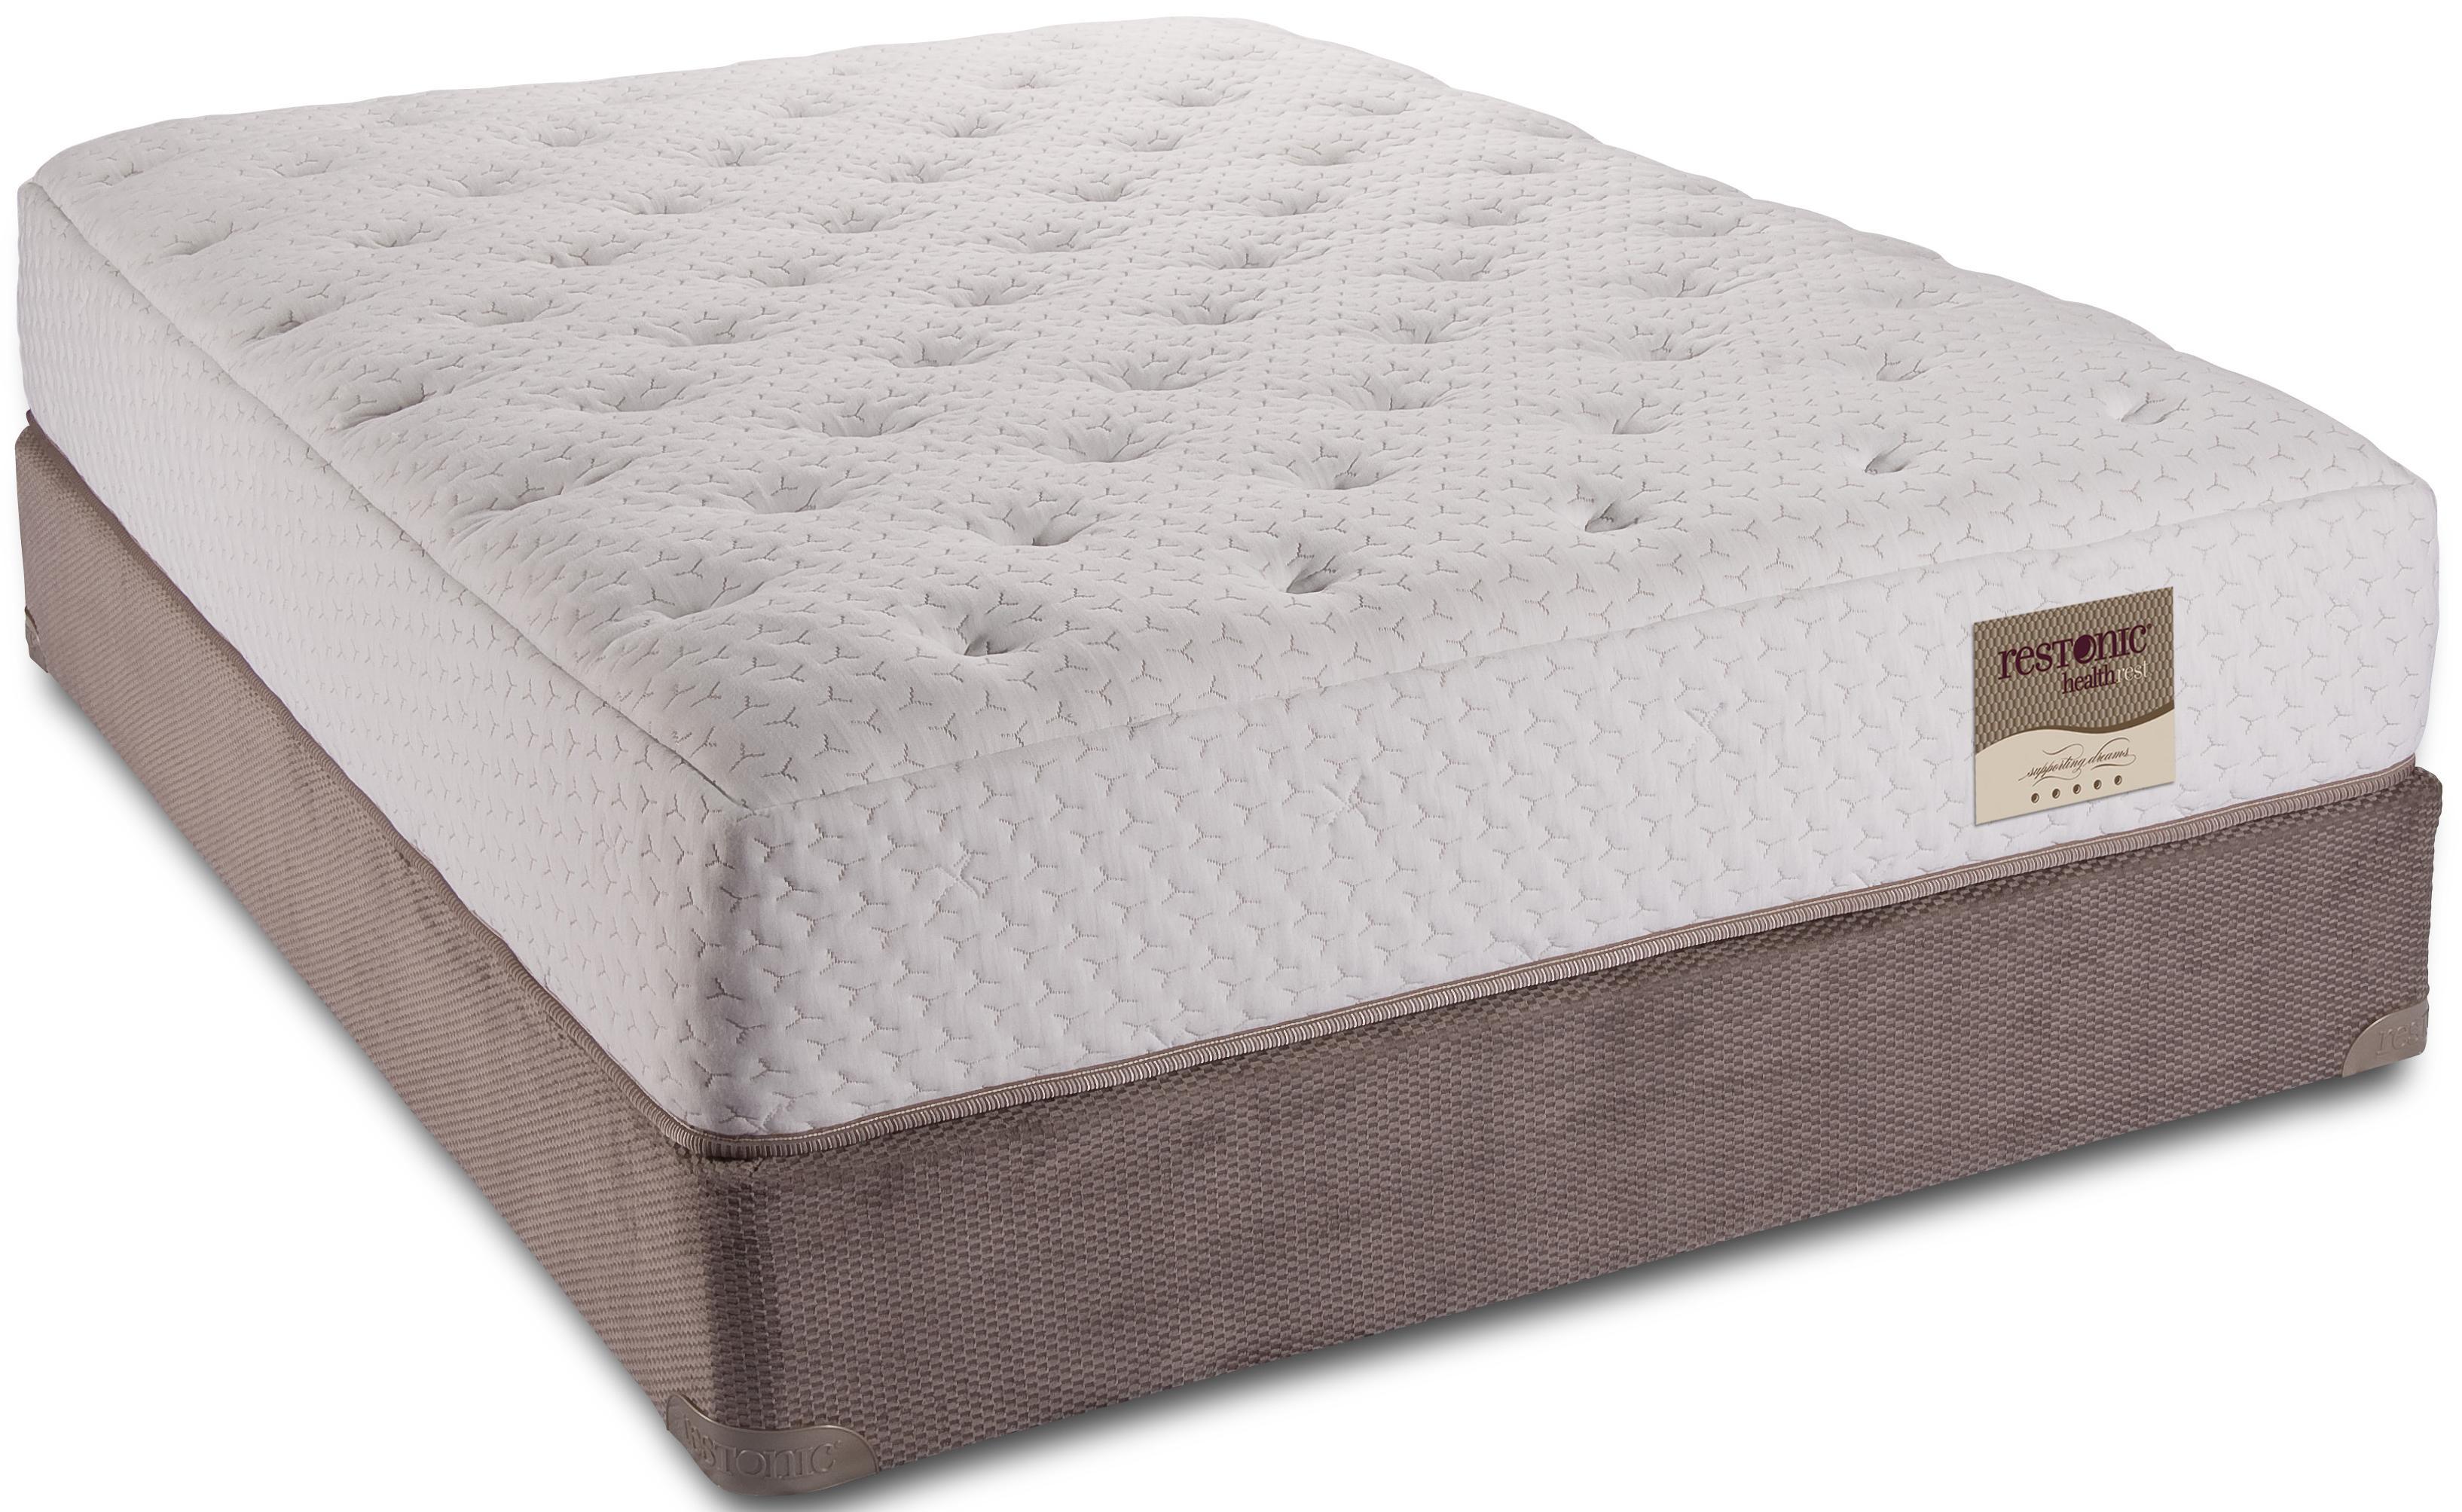 restonic picture reviews com serta goodbed mattresses mattress